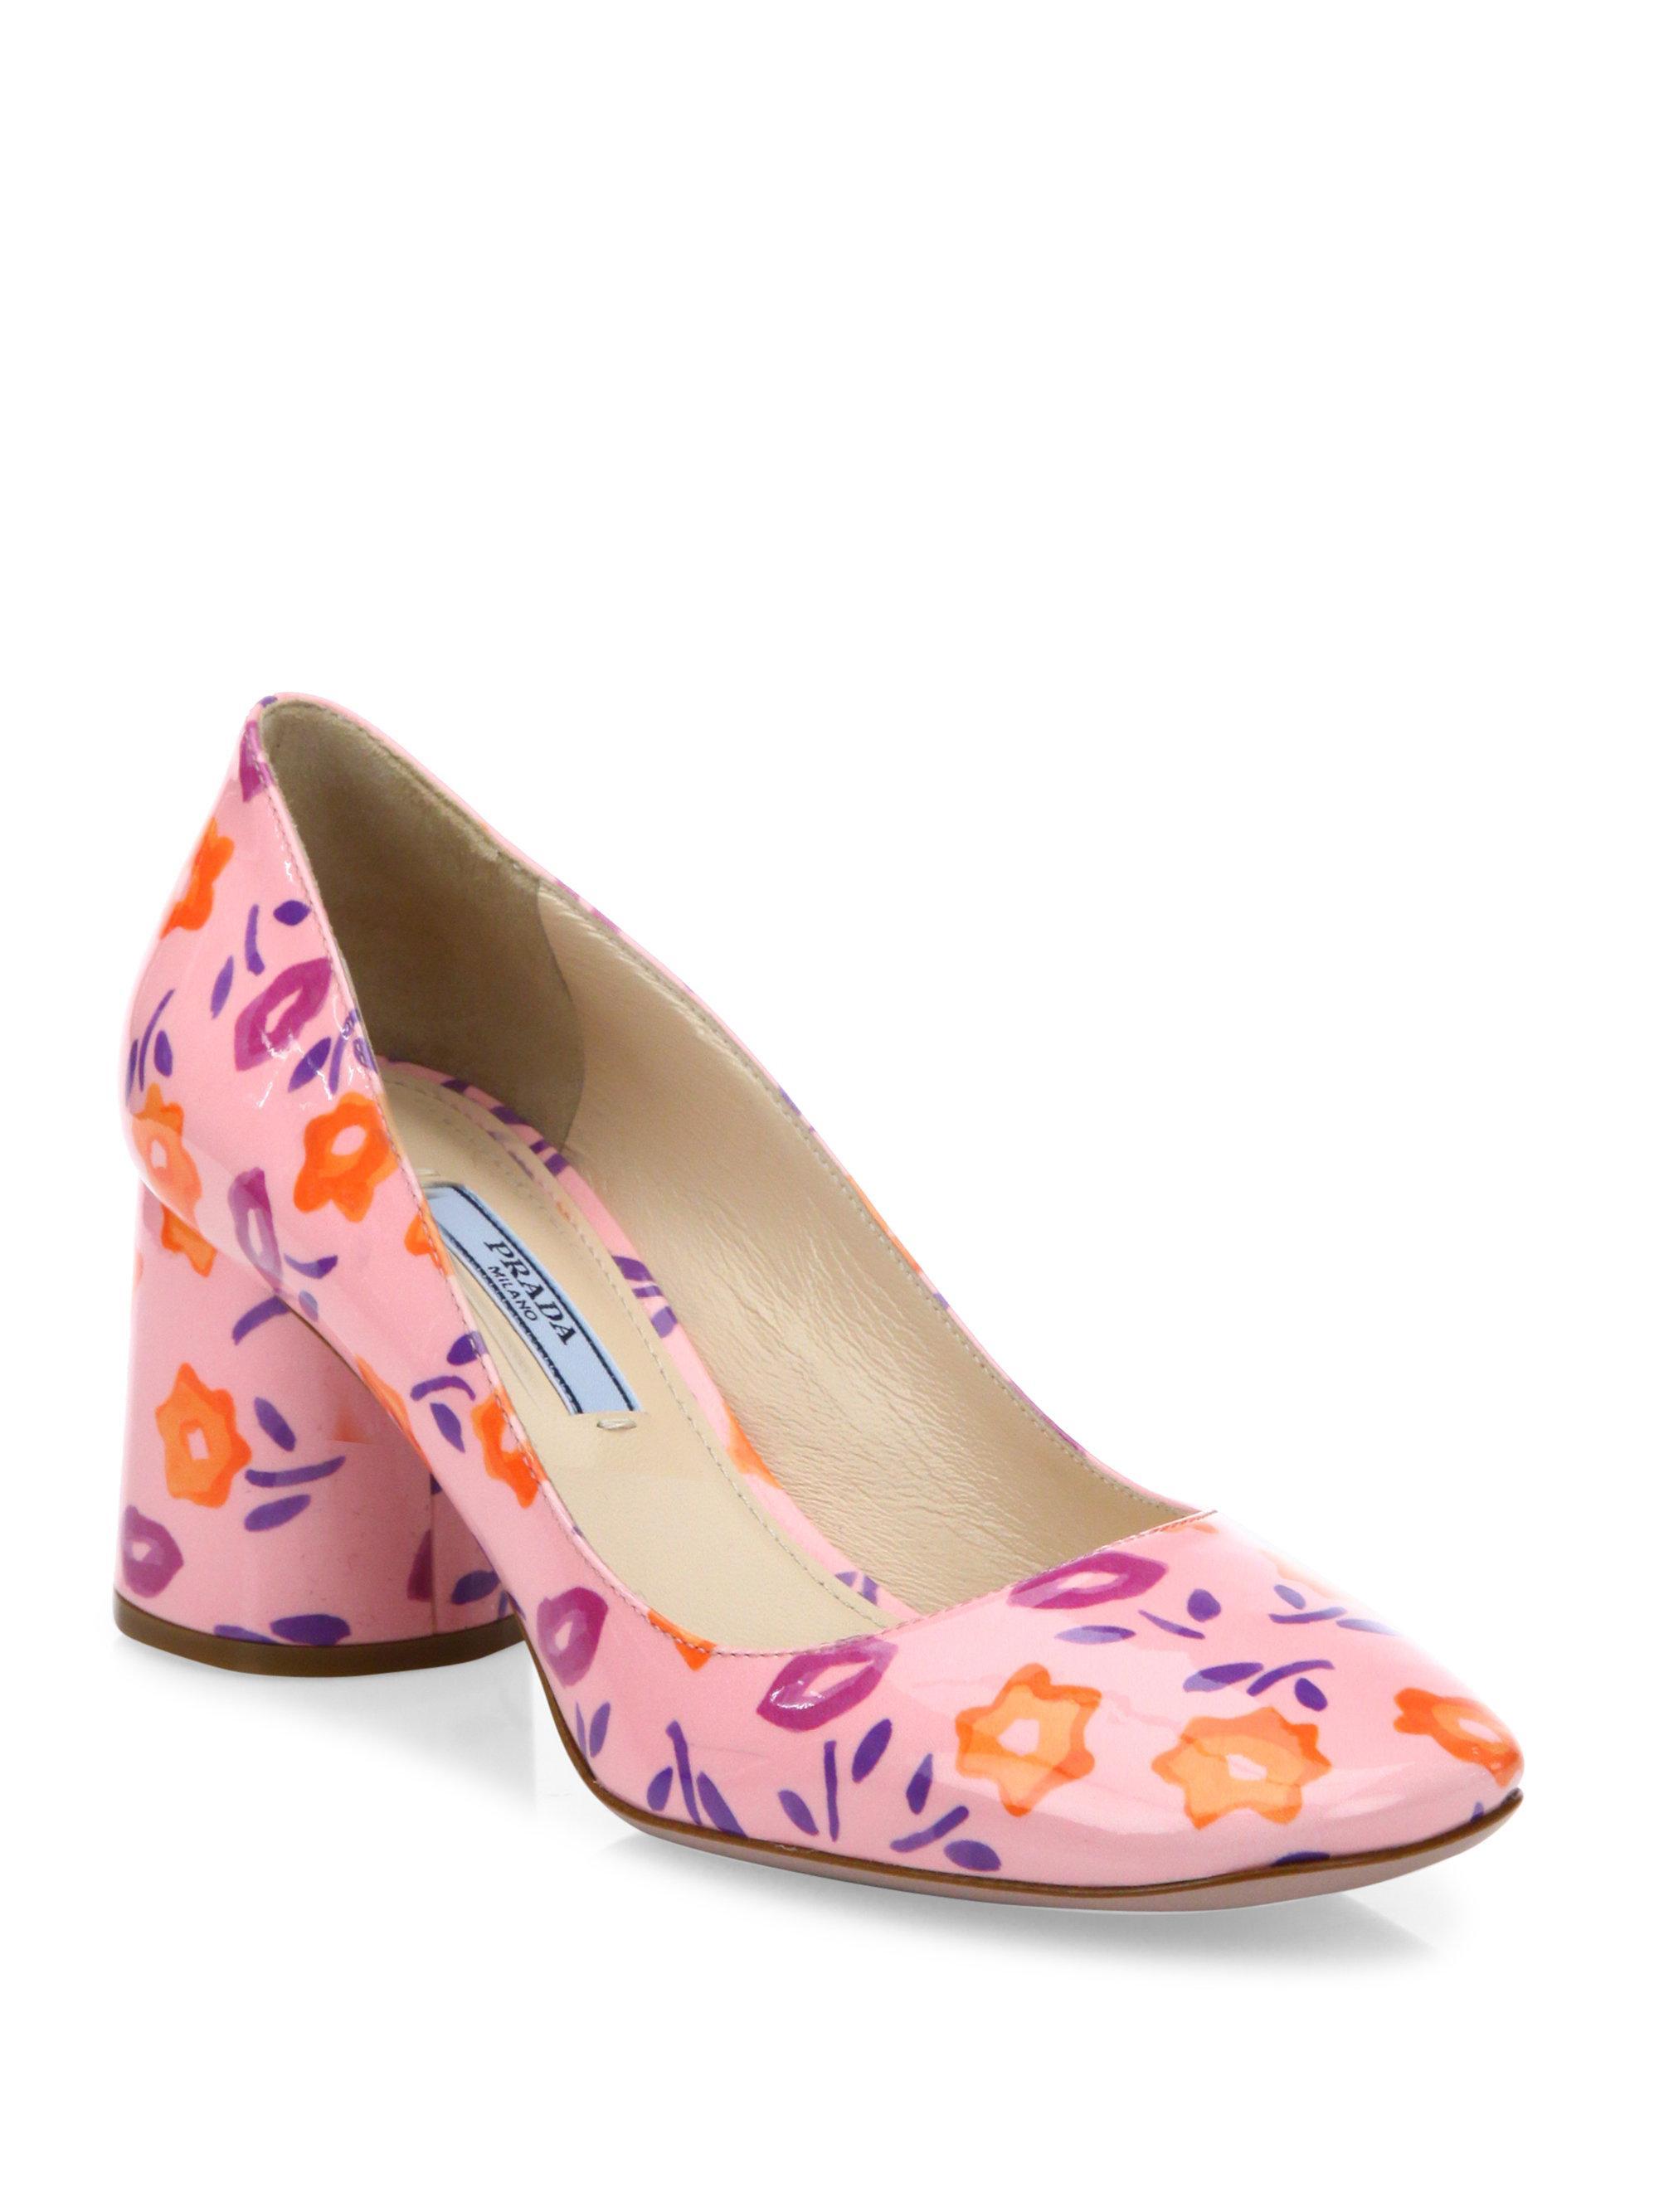 Lyst Prada Flower Print Patent Leather Block Heel Pumps In Pink